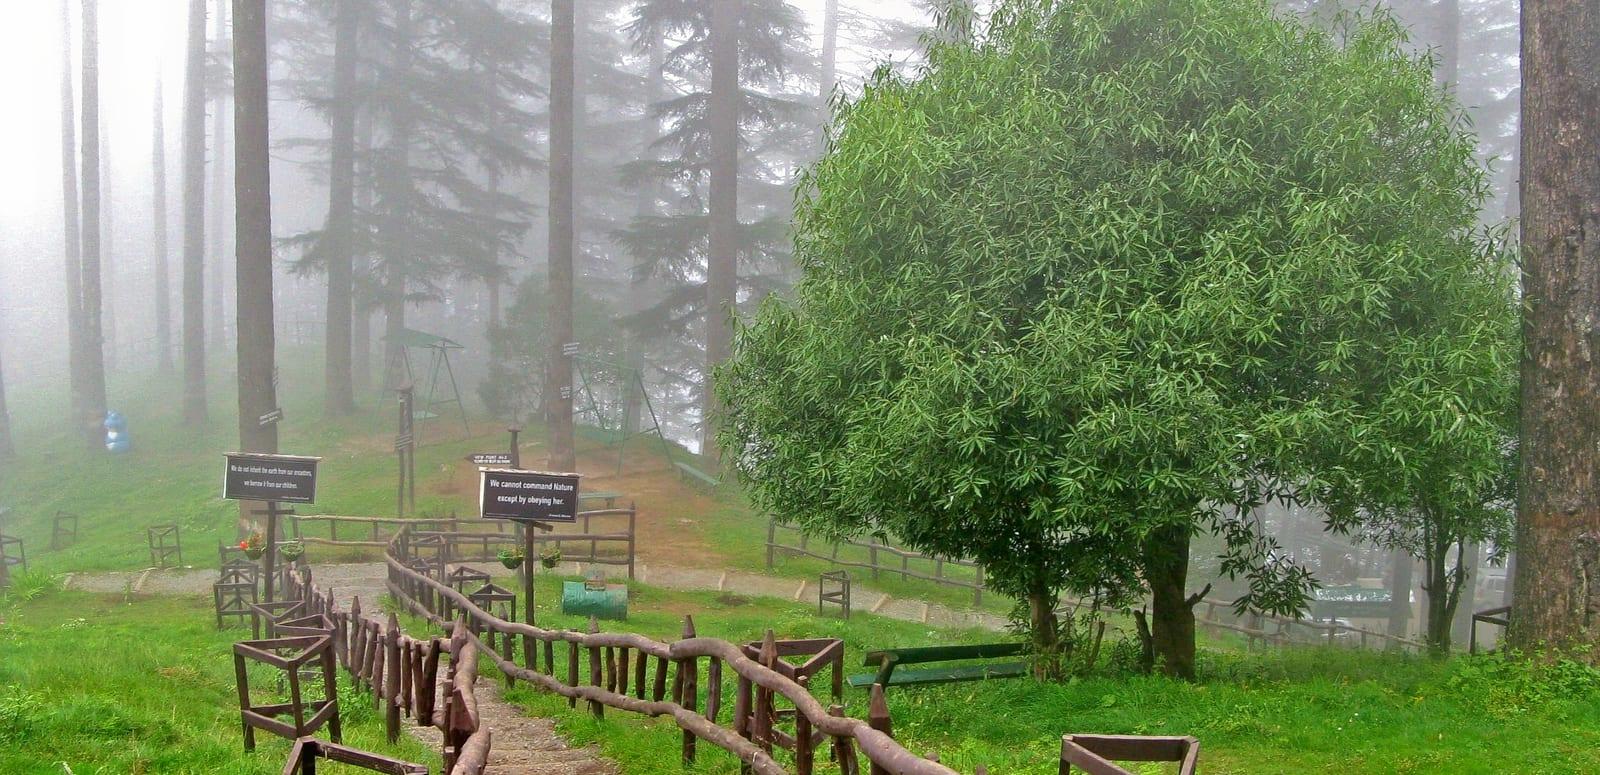 1492603821_dhanaulti_eco_park.jpg